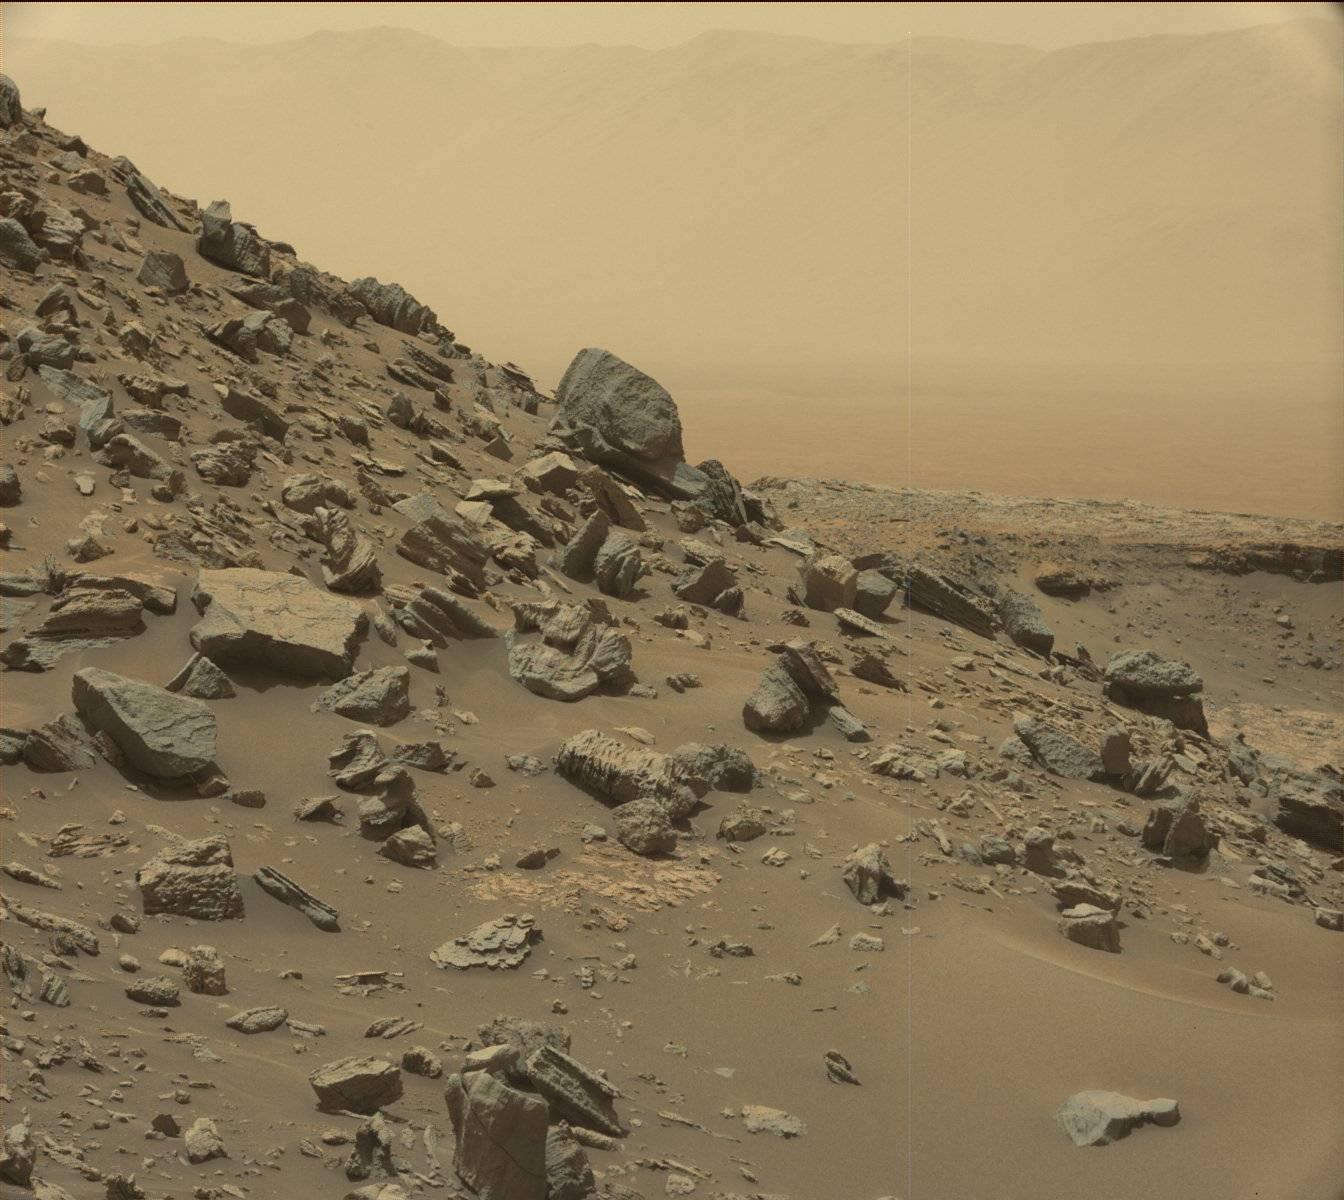 16-09-08-mars-curiosity-rover-msl-rock-pia21041-full